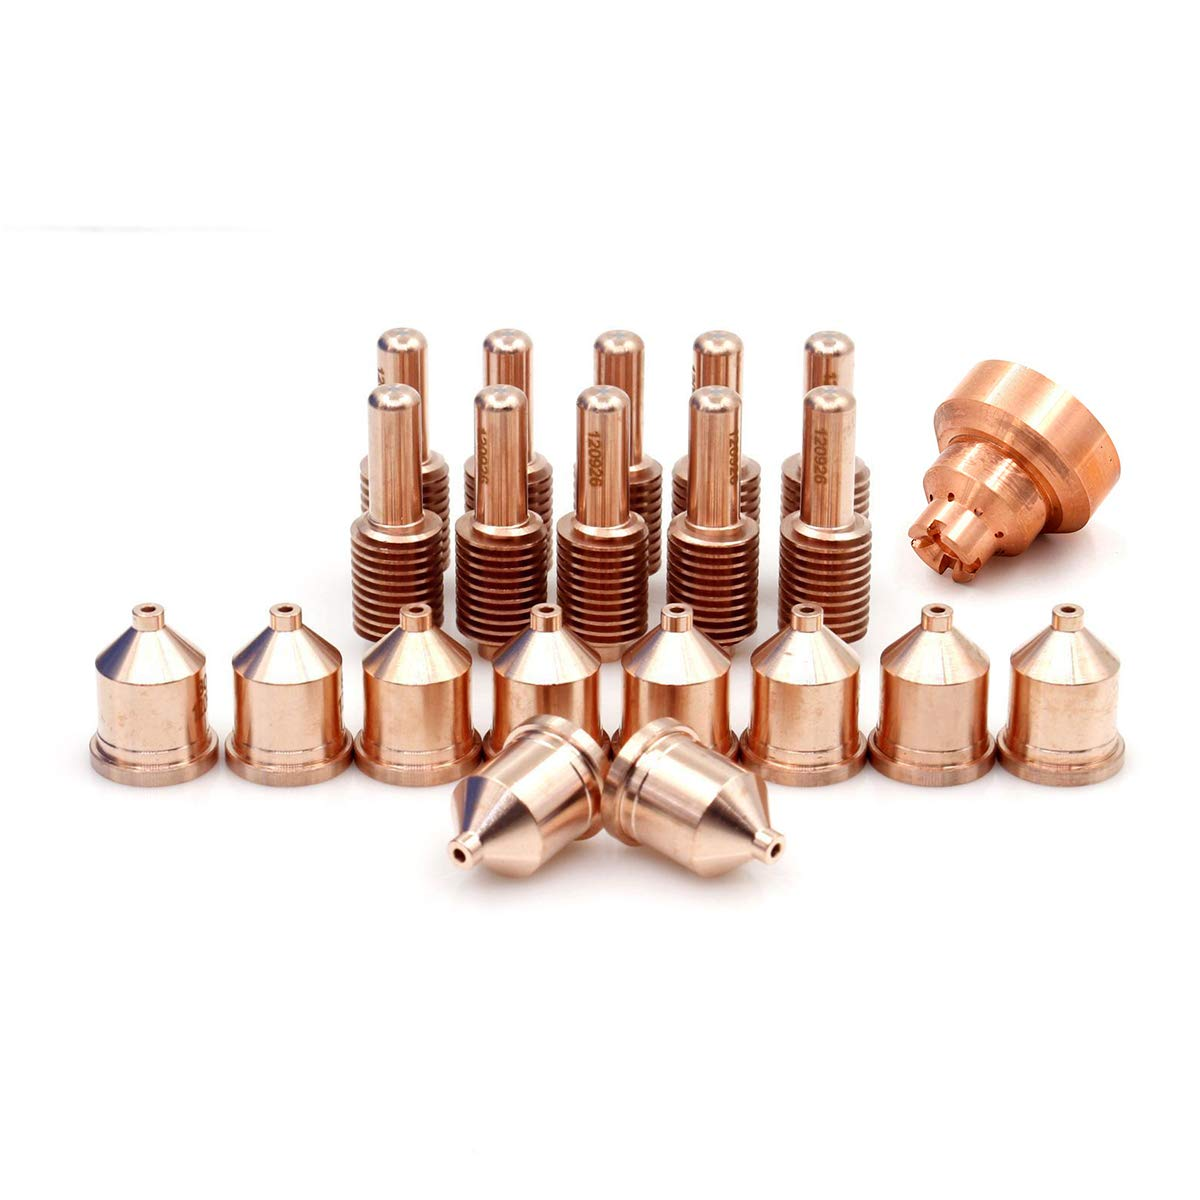 10 x Electrode 120926 + Super sale Tip Shield Cap Super beauty product restock quality top! 1 120929 120931